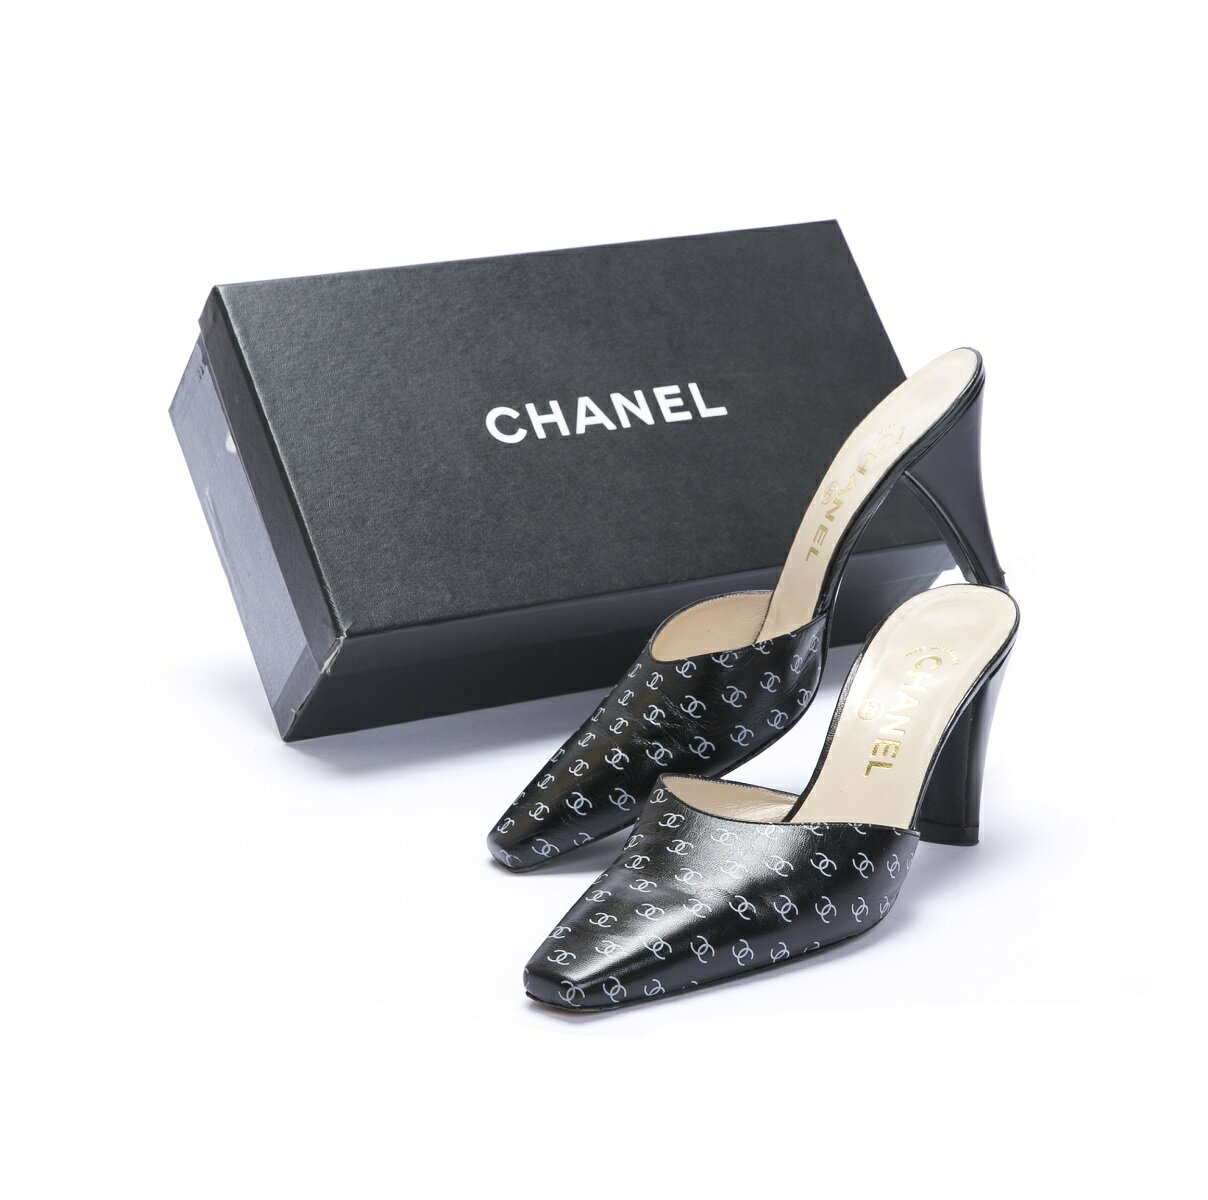 CHANEL シャネル ミュール 靴 #38 ココマーク レザー 【トレジャースポット】【中古】